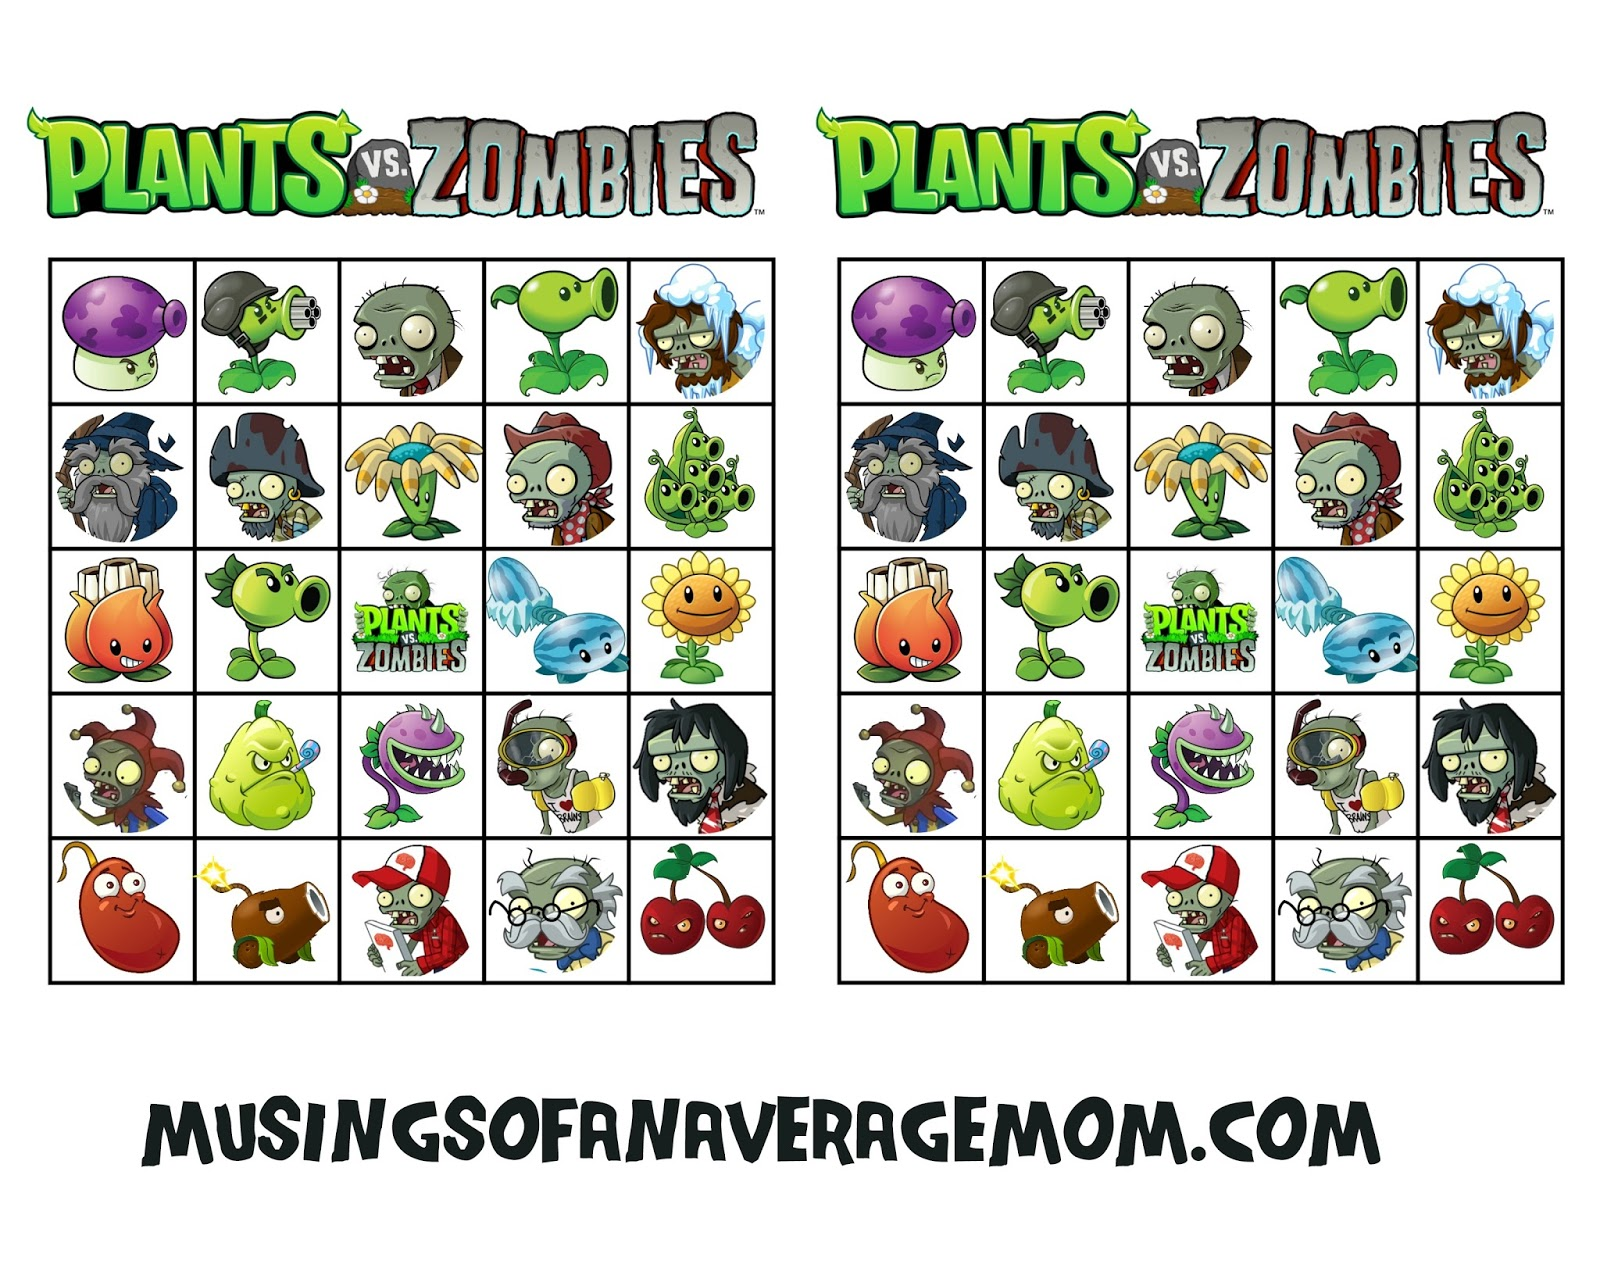 Musings of an Average Mom: Plants vs. Zombies bingo